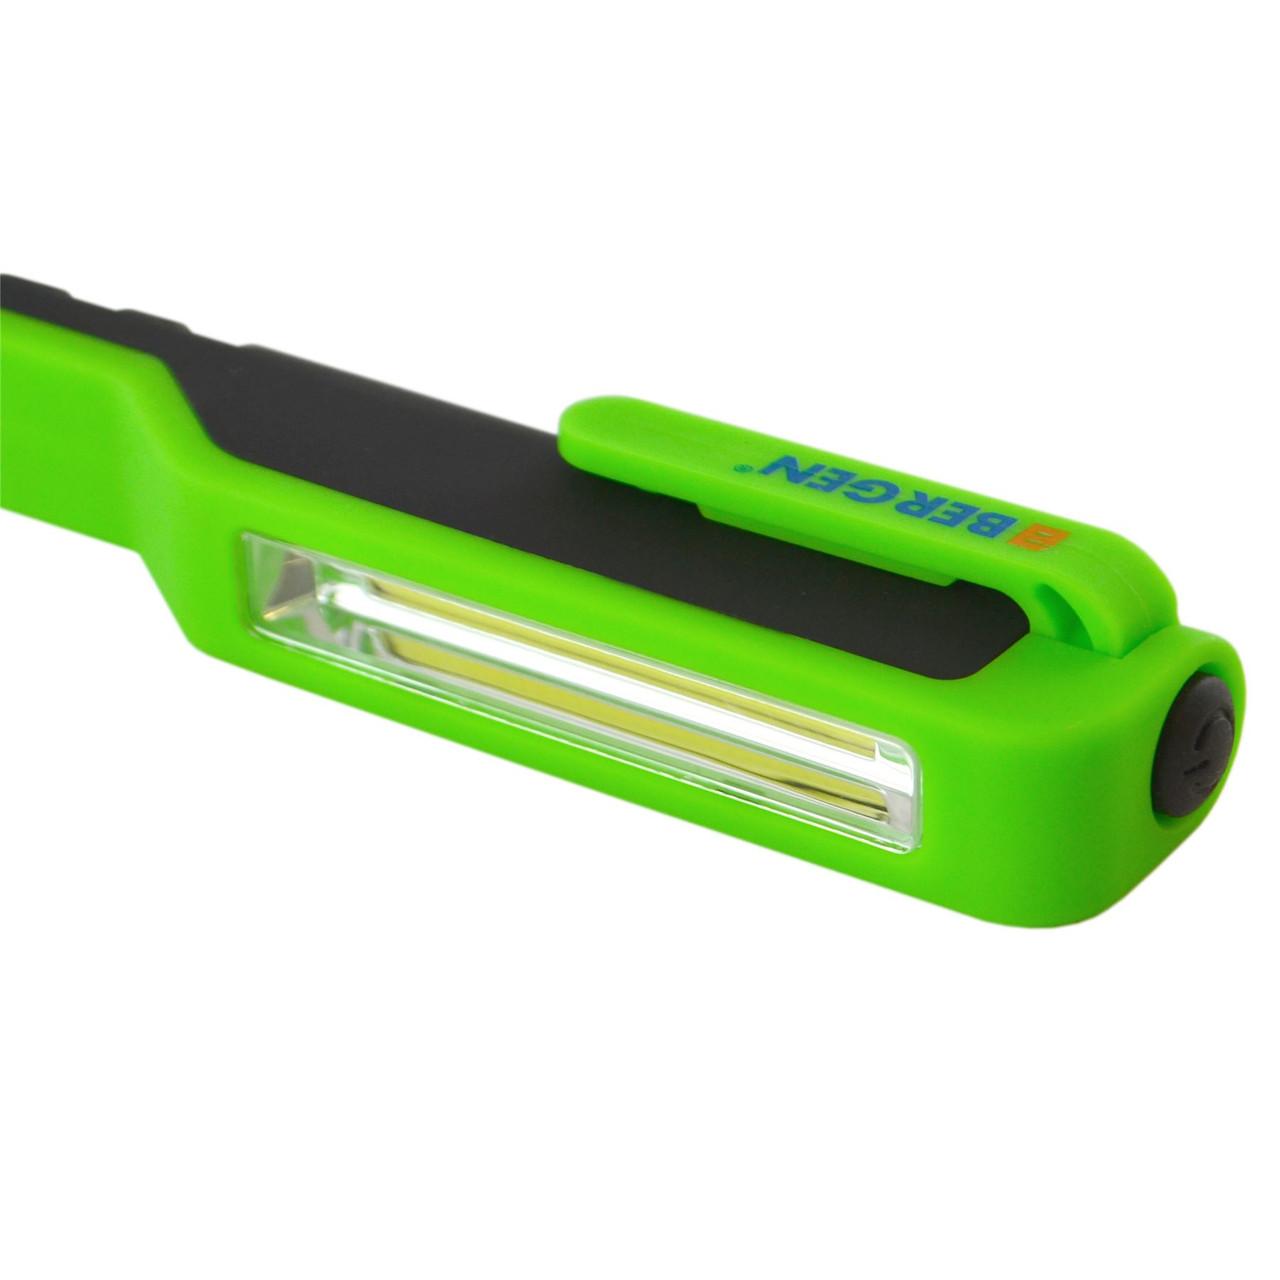 BERGEN Mini COB Inspection Work Hand Lamp Light Torch Pen Pocket Size Flashlight